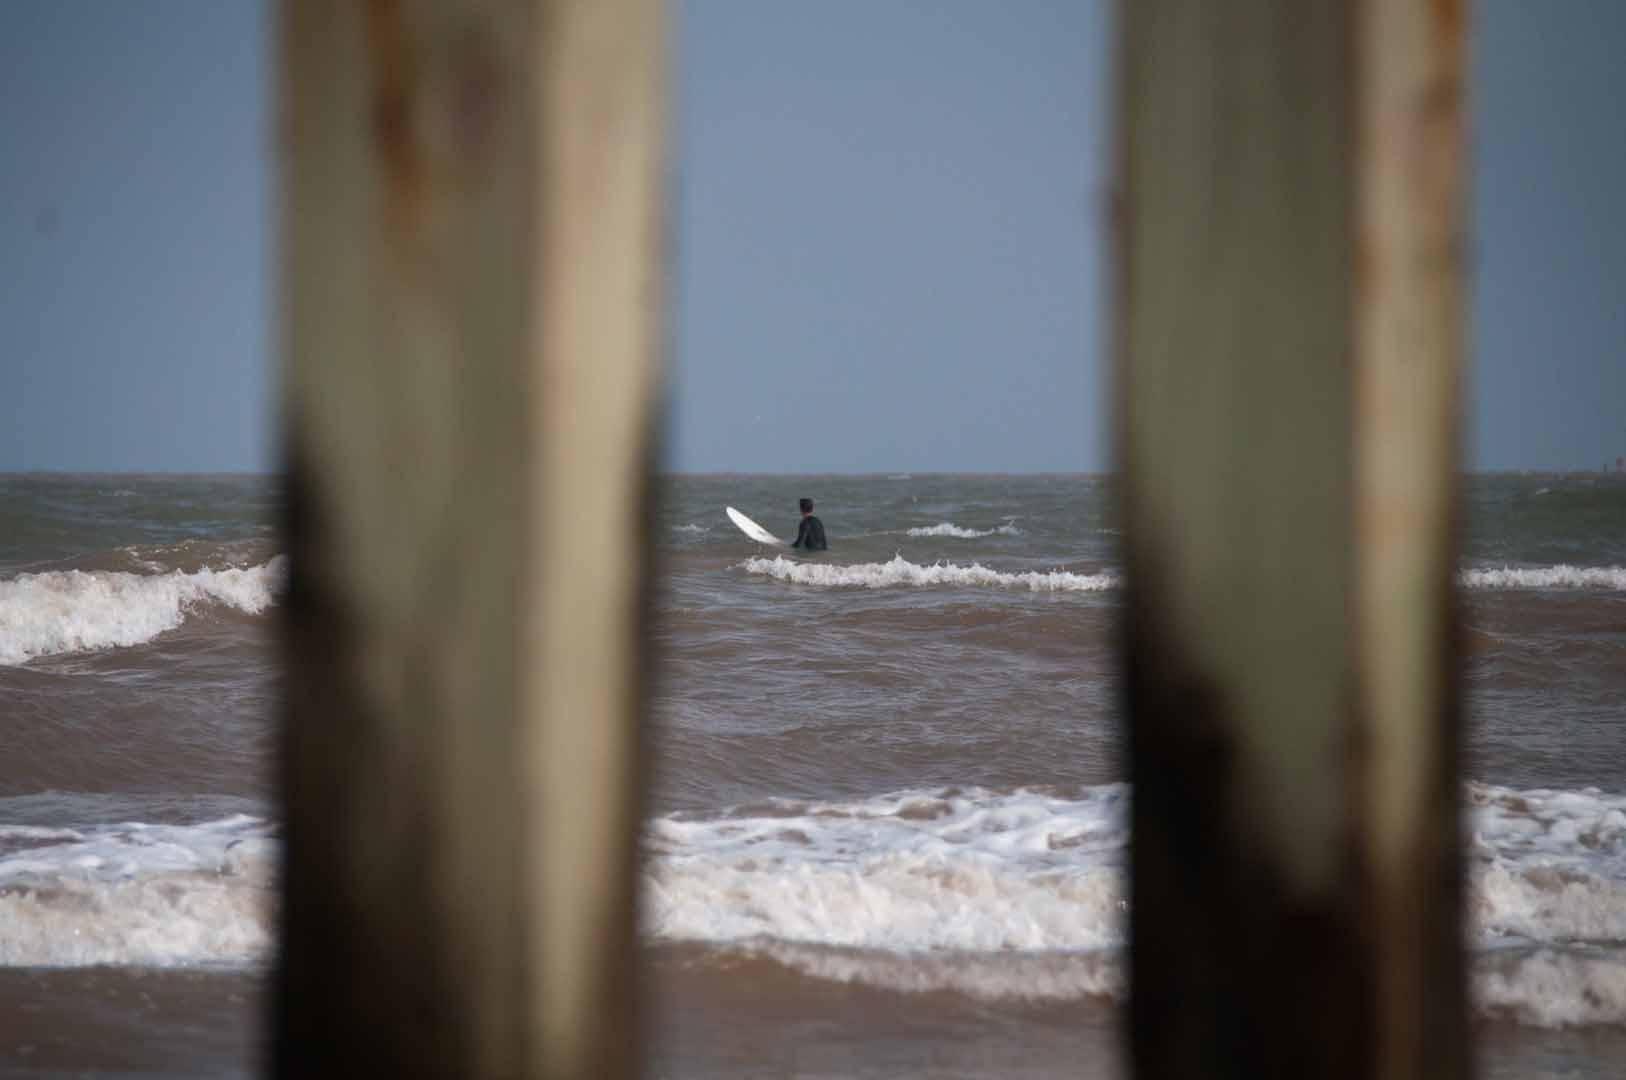 SurfsideJuly2_20150702_185